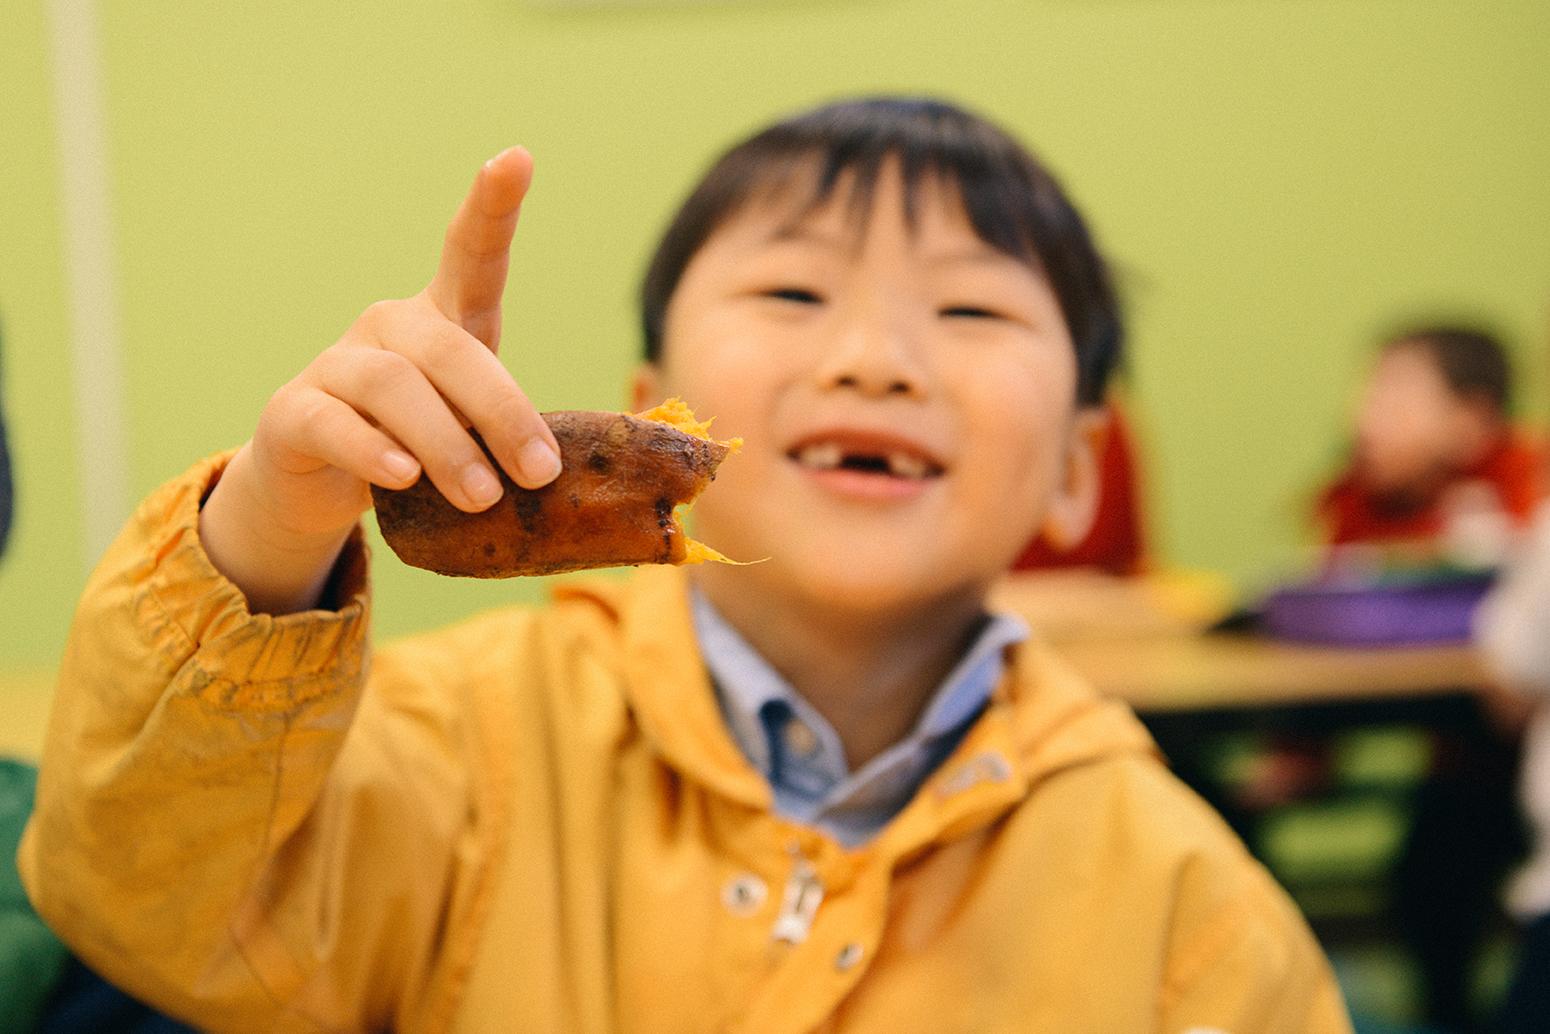 A Grain of Good: Kelsey & the Environmental Charter School